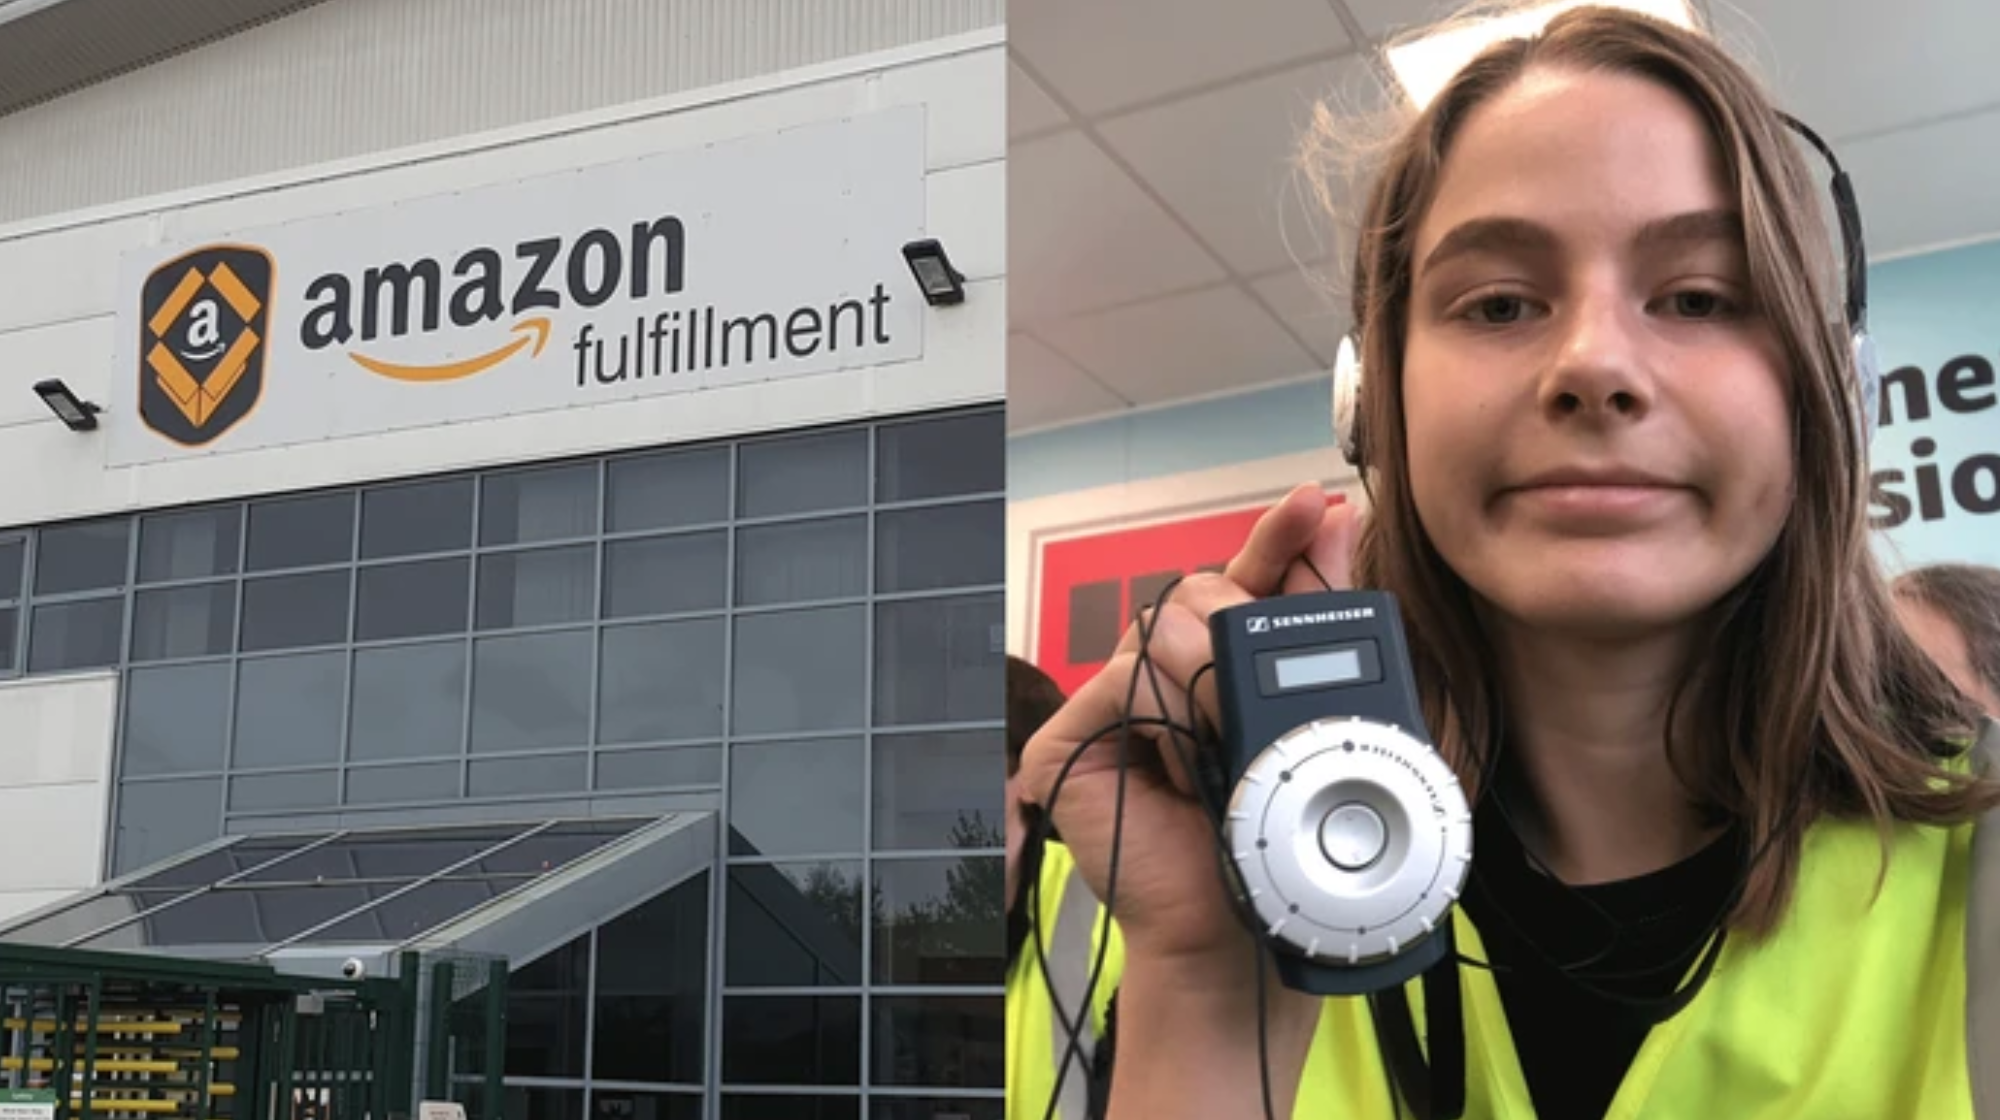 I Went On A Propaganda Tour Of An Amazon Warehouse